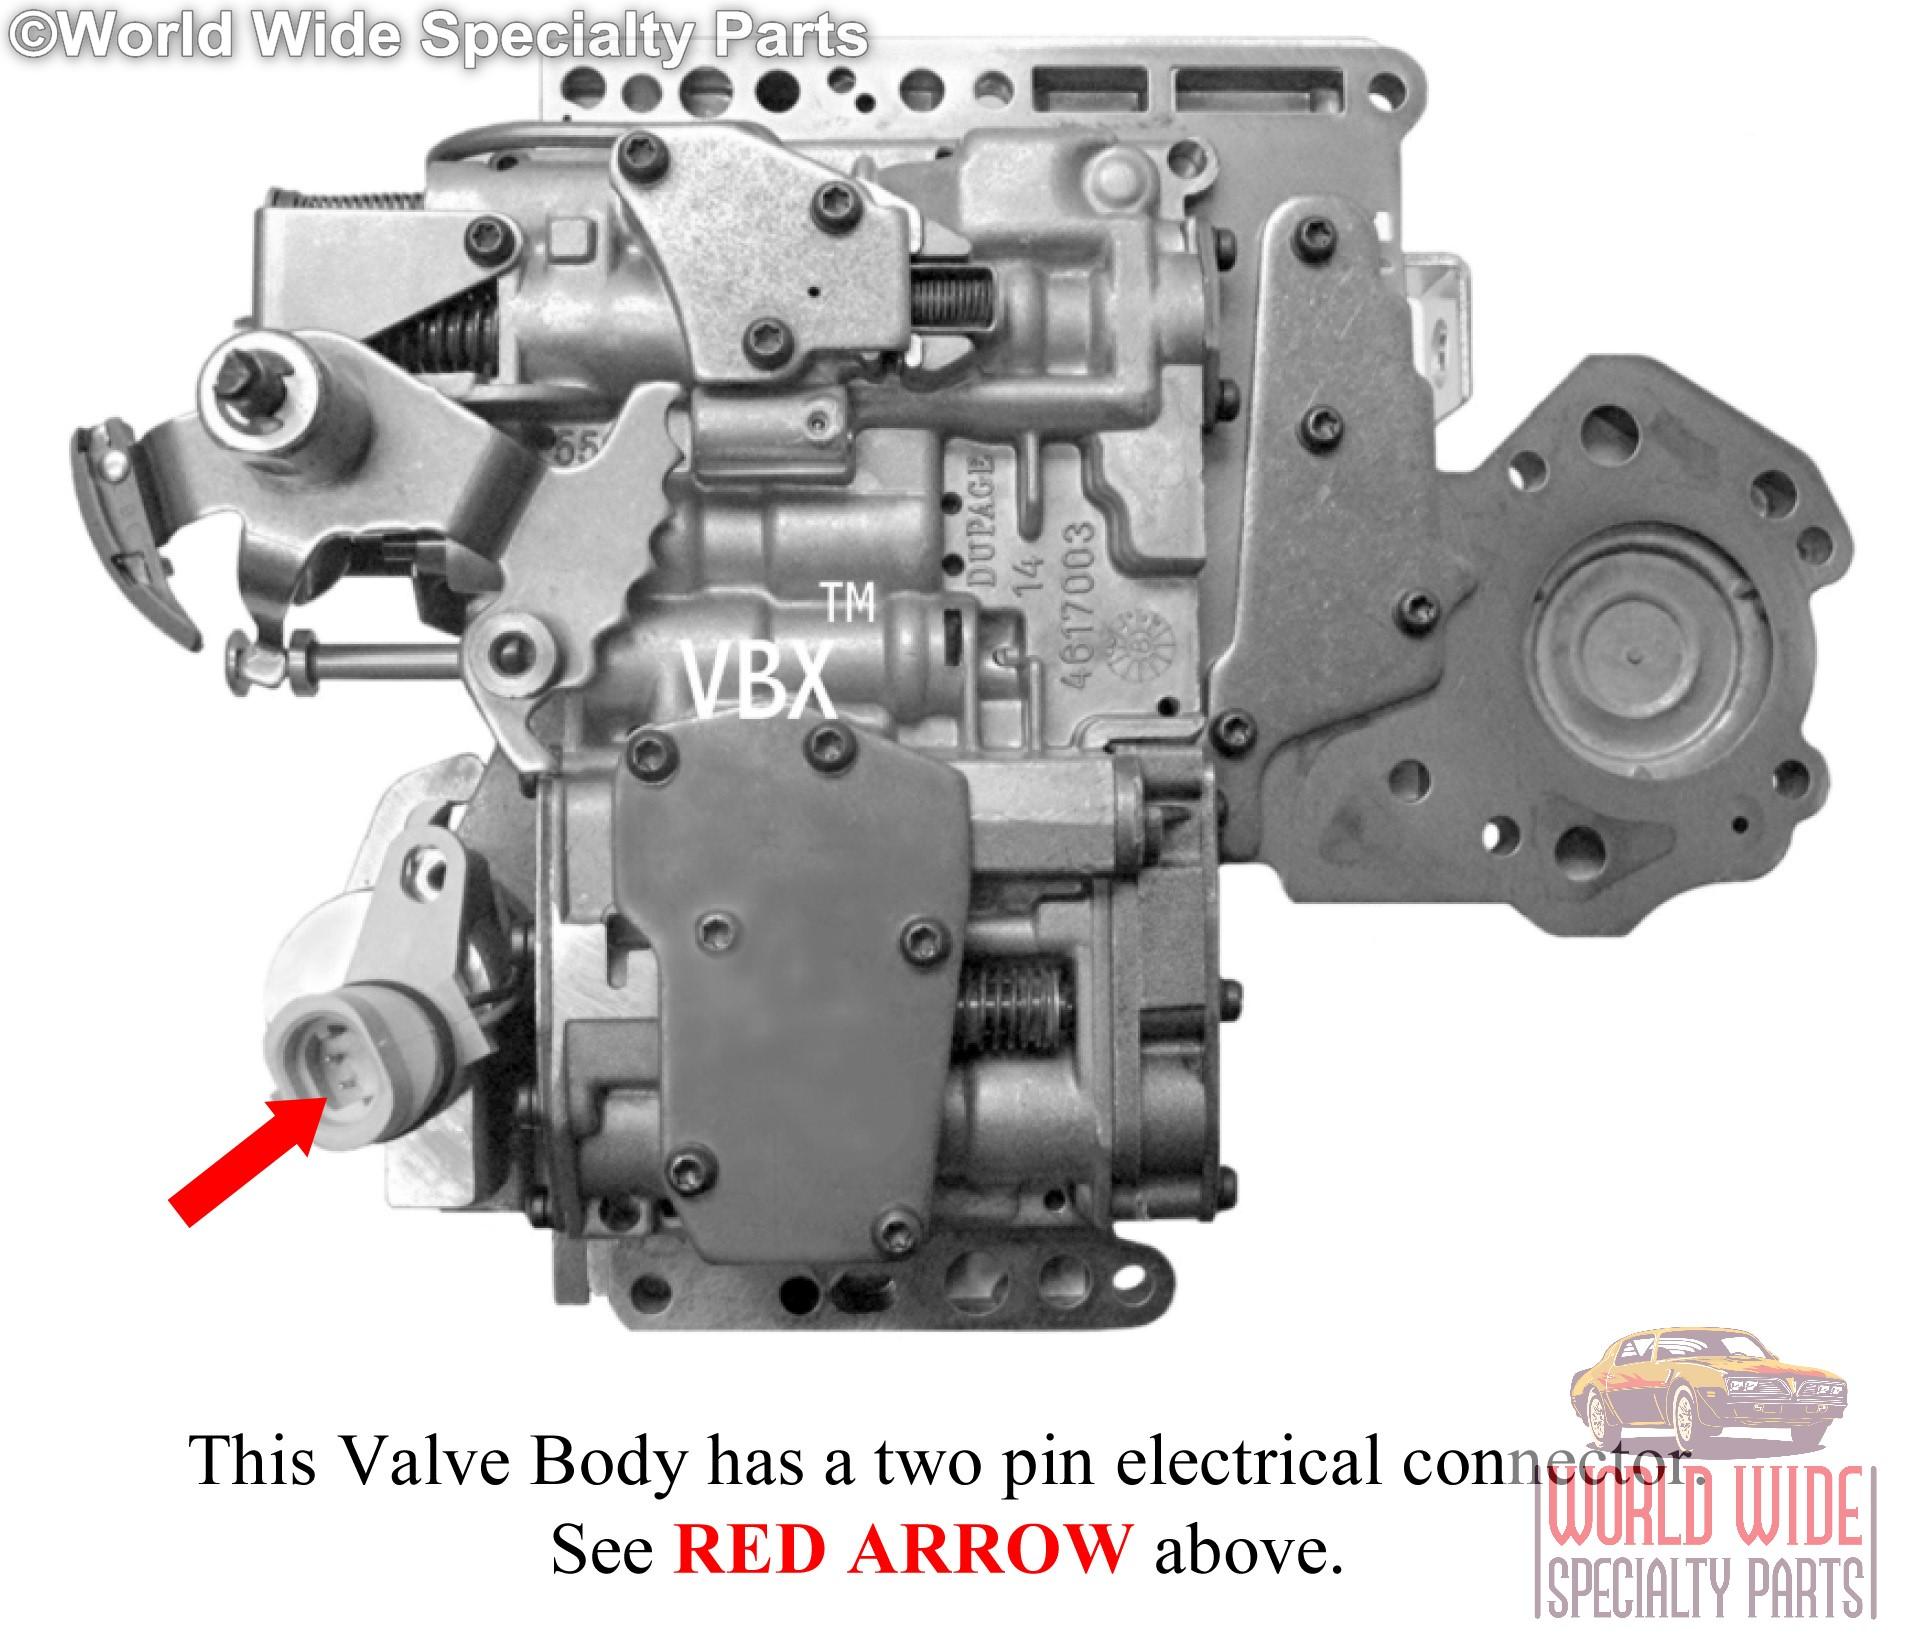 Lockup 47RH Valve Body 1990-1999 Chrysler 46RH HD Towing Mod. Boost Tube